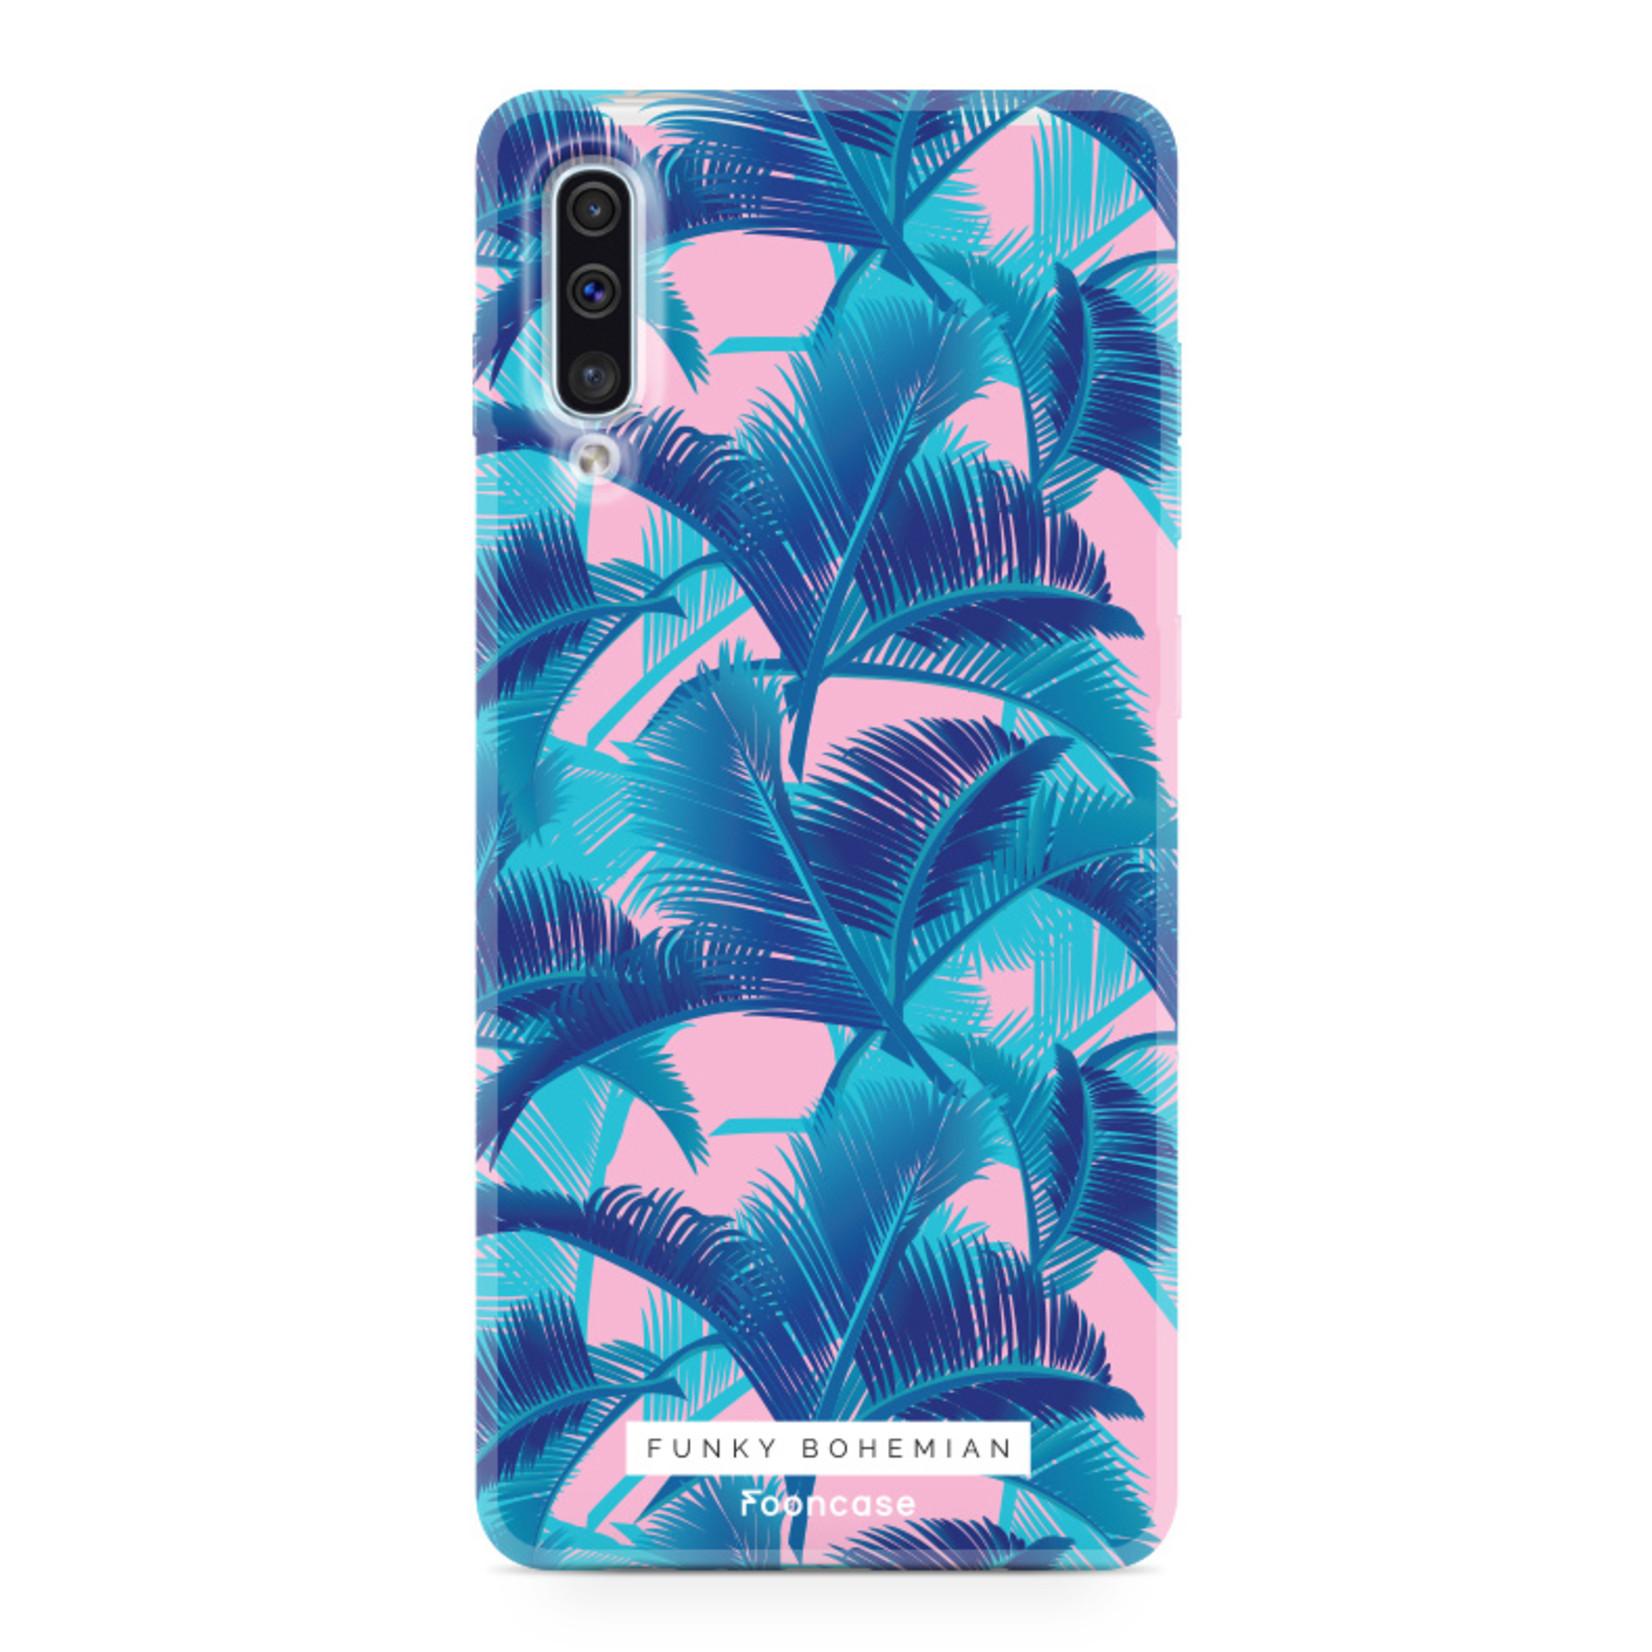 Samsung Galaxy A70 hoesje TPU Soft Case - Back Cover - Funky Bohemian / Blauw Roze Bladeren